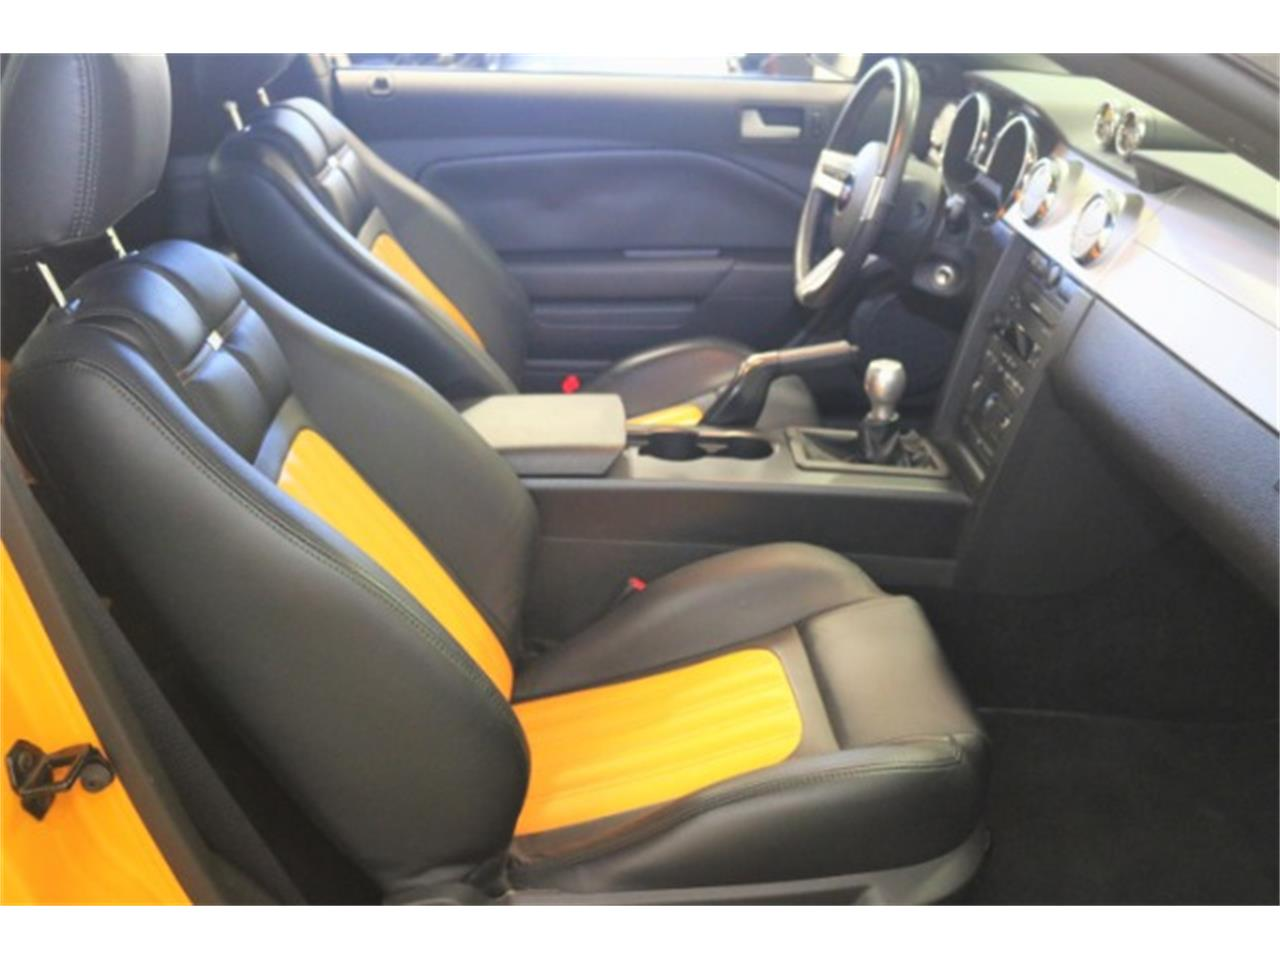 2007 Ford Mustang (CC-1415336) for sale in San Ramon, California